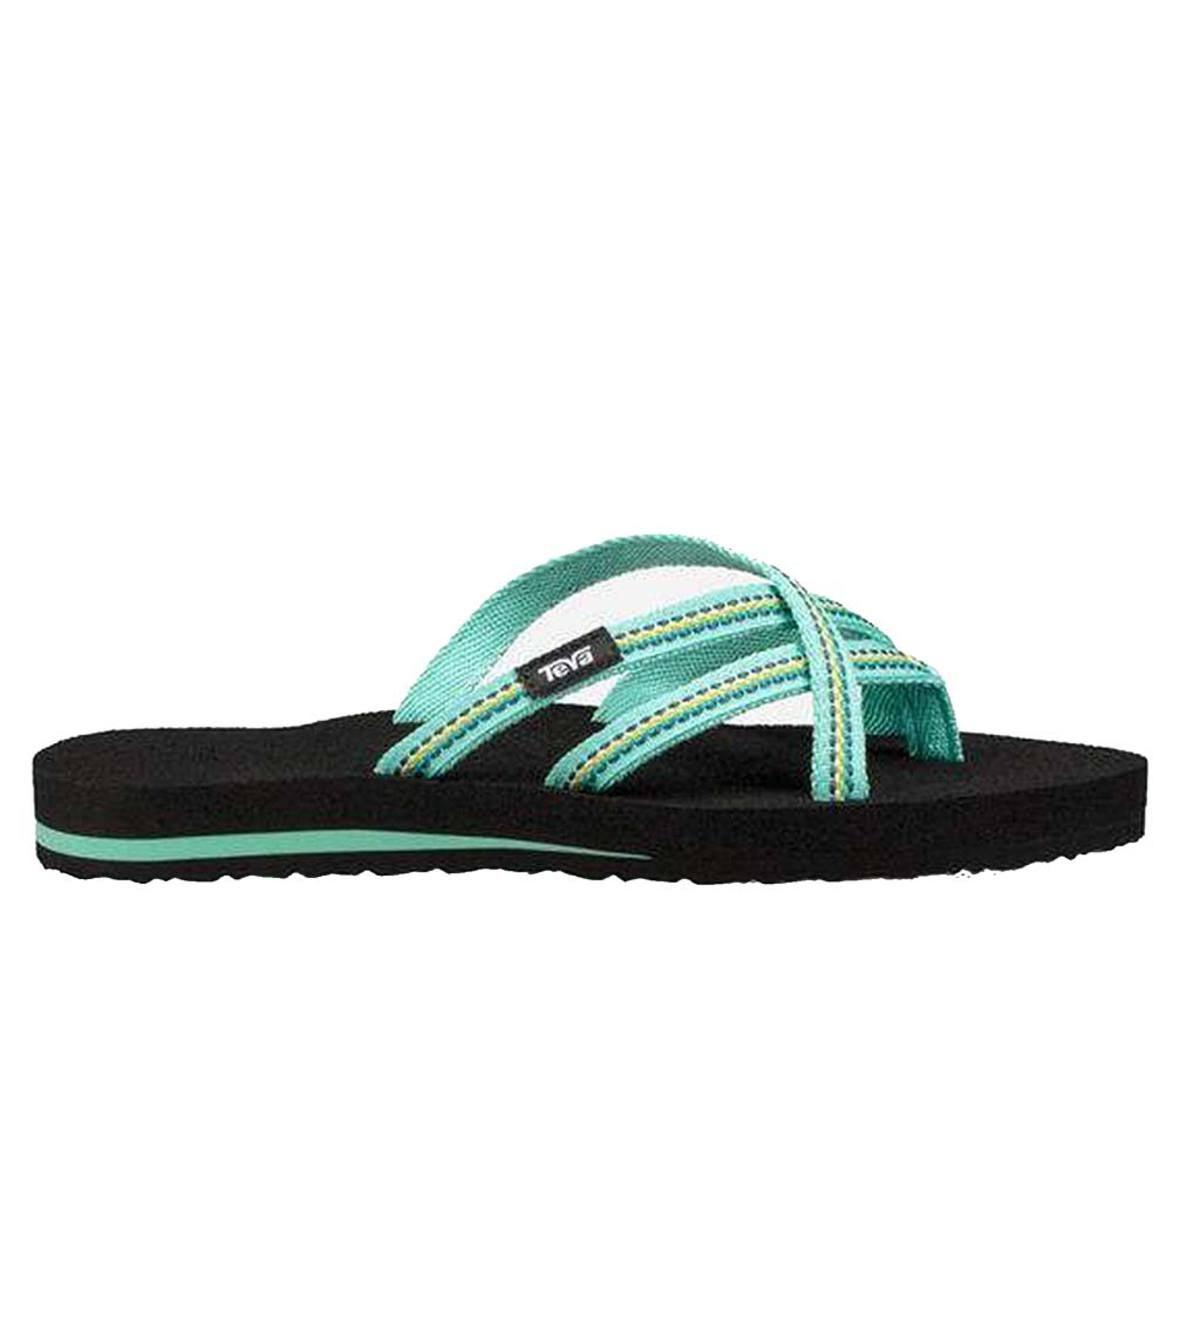 45e6ac7a3 Teva Women s Mush Olowahu Flip Flops - Sea Glass - Size 6